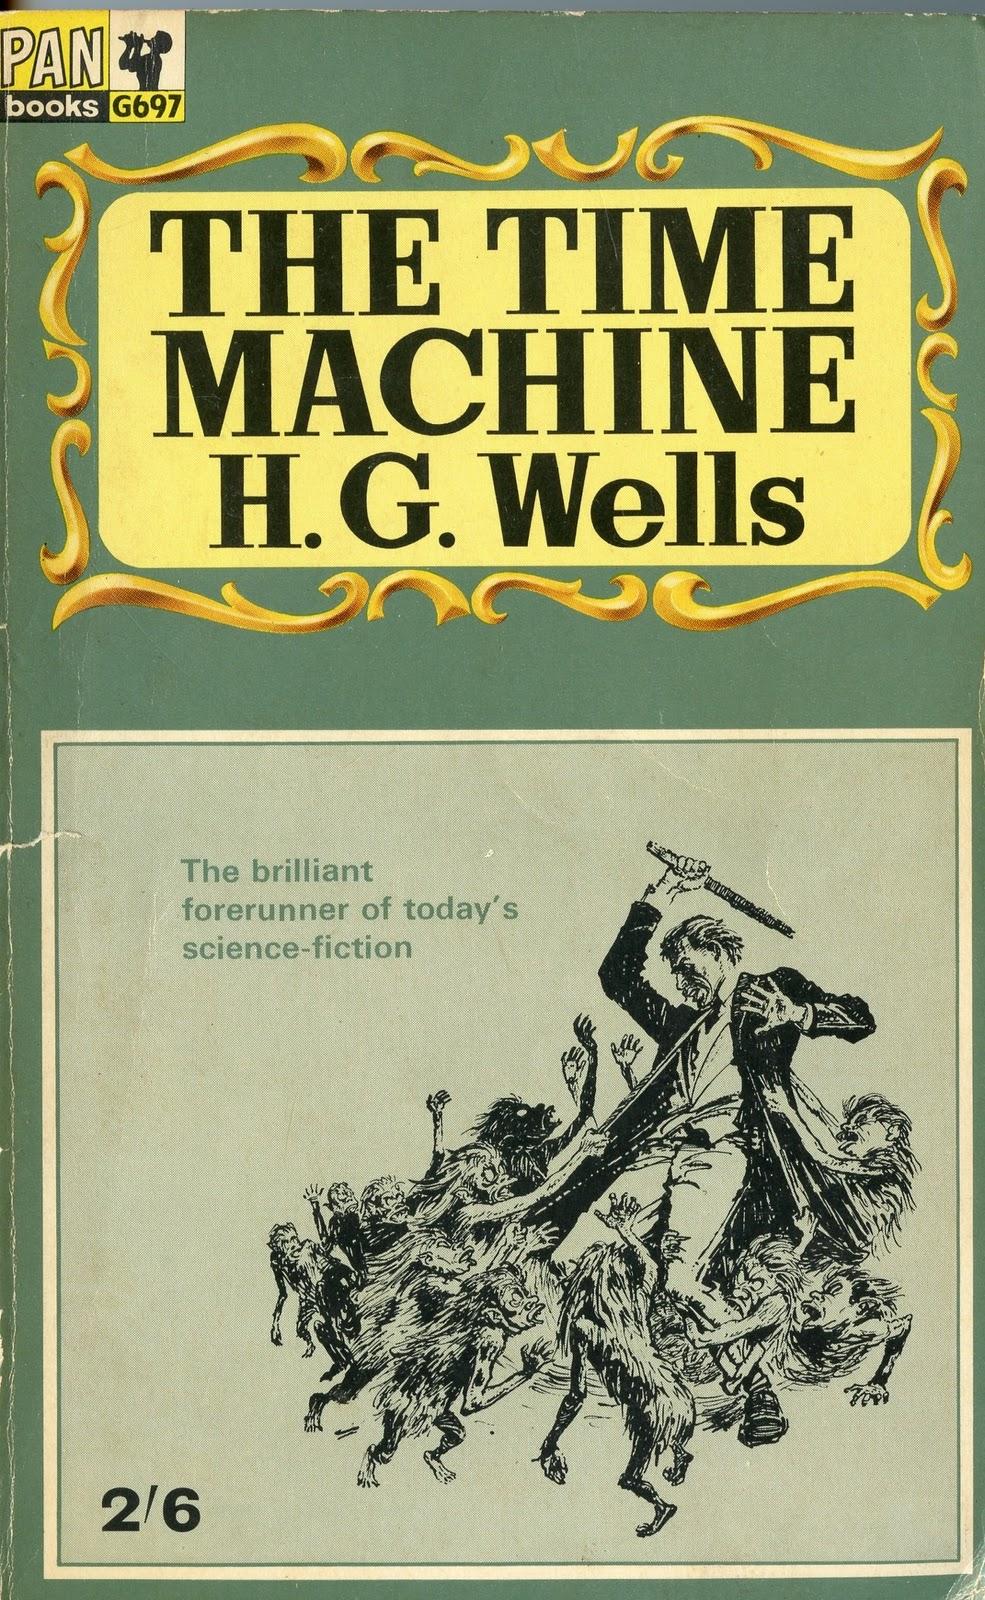 Amazon.com: The Time Machine (9780553213515): Wells, H. G ...